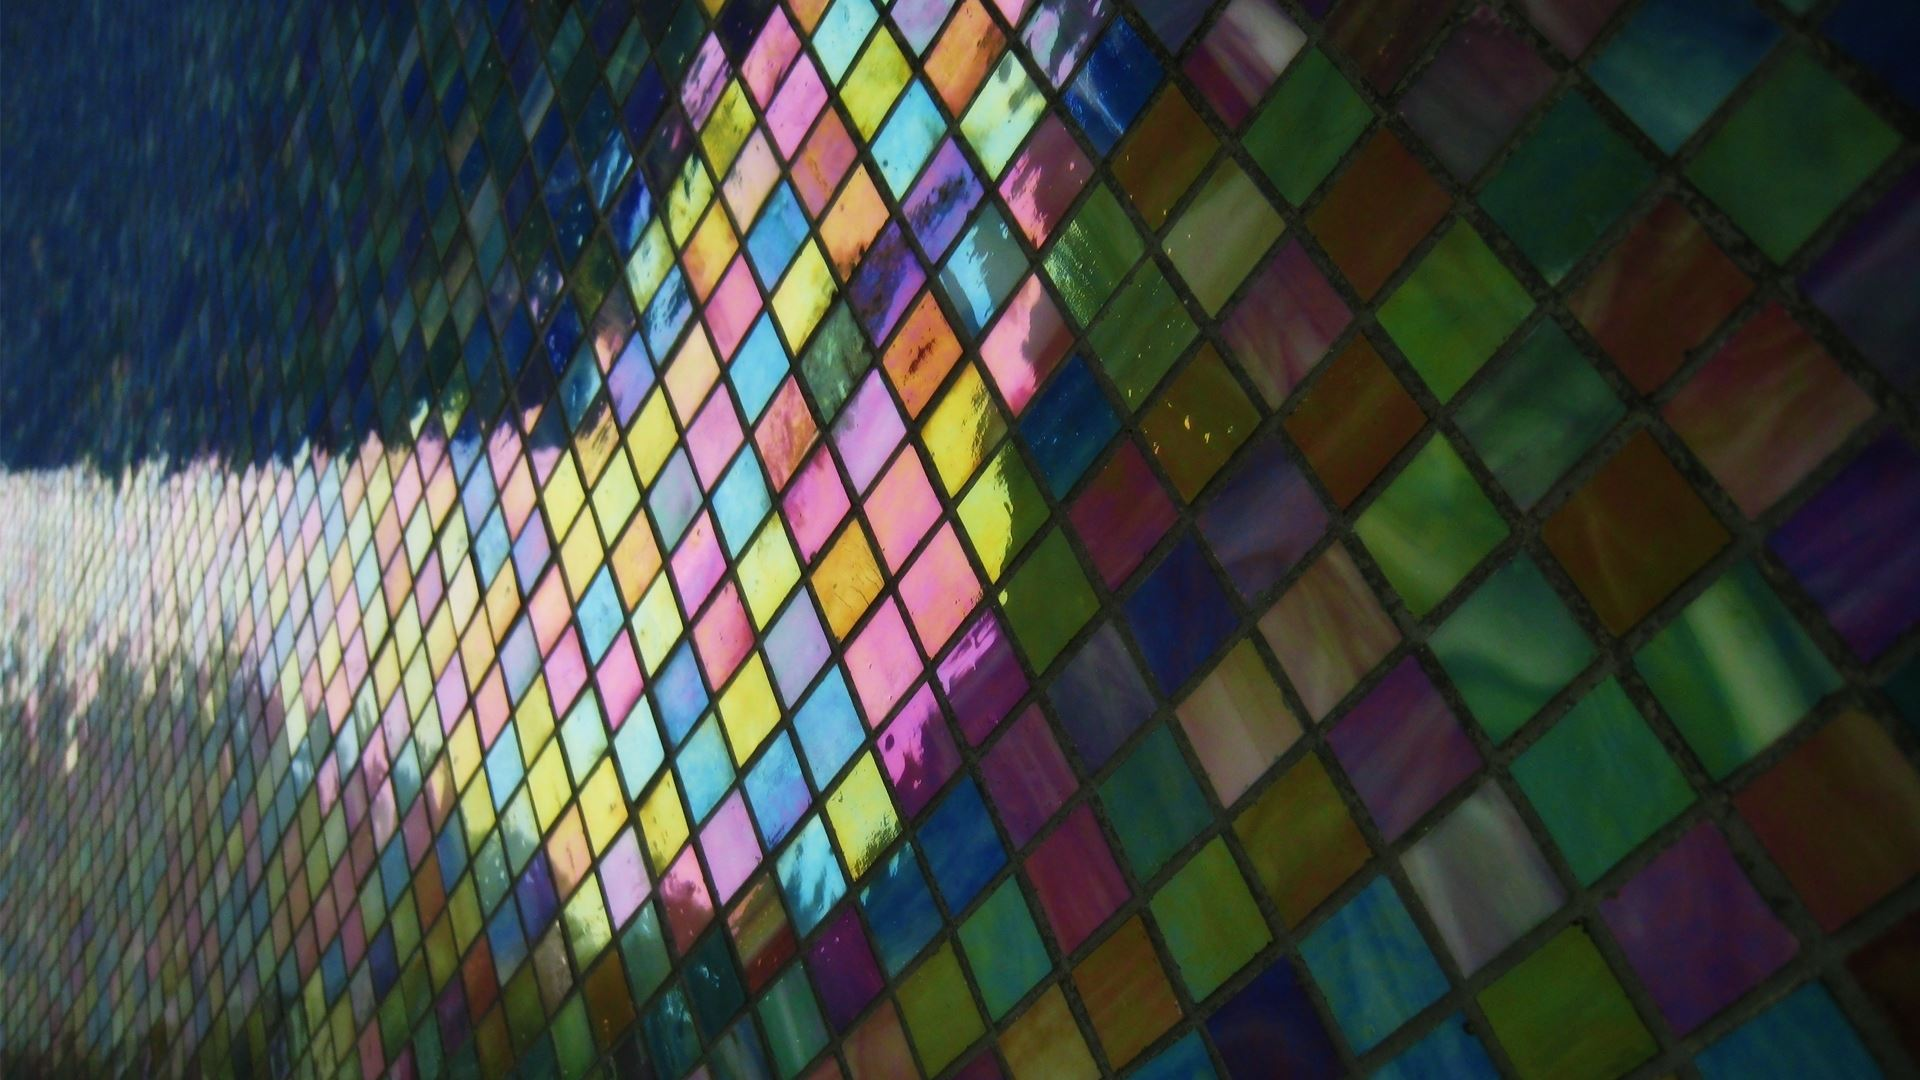 pics photos mosaic background wallpaper